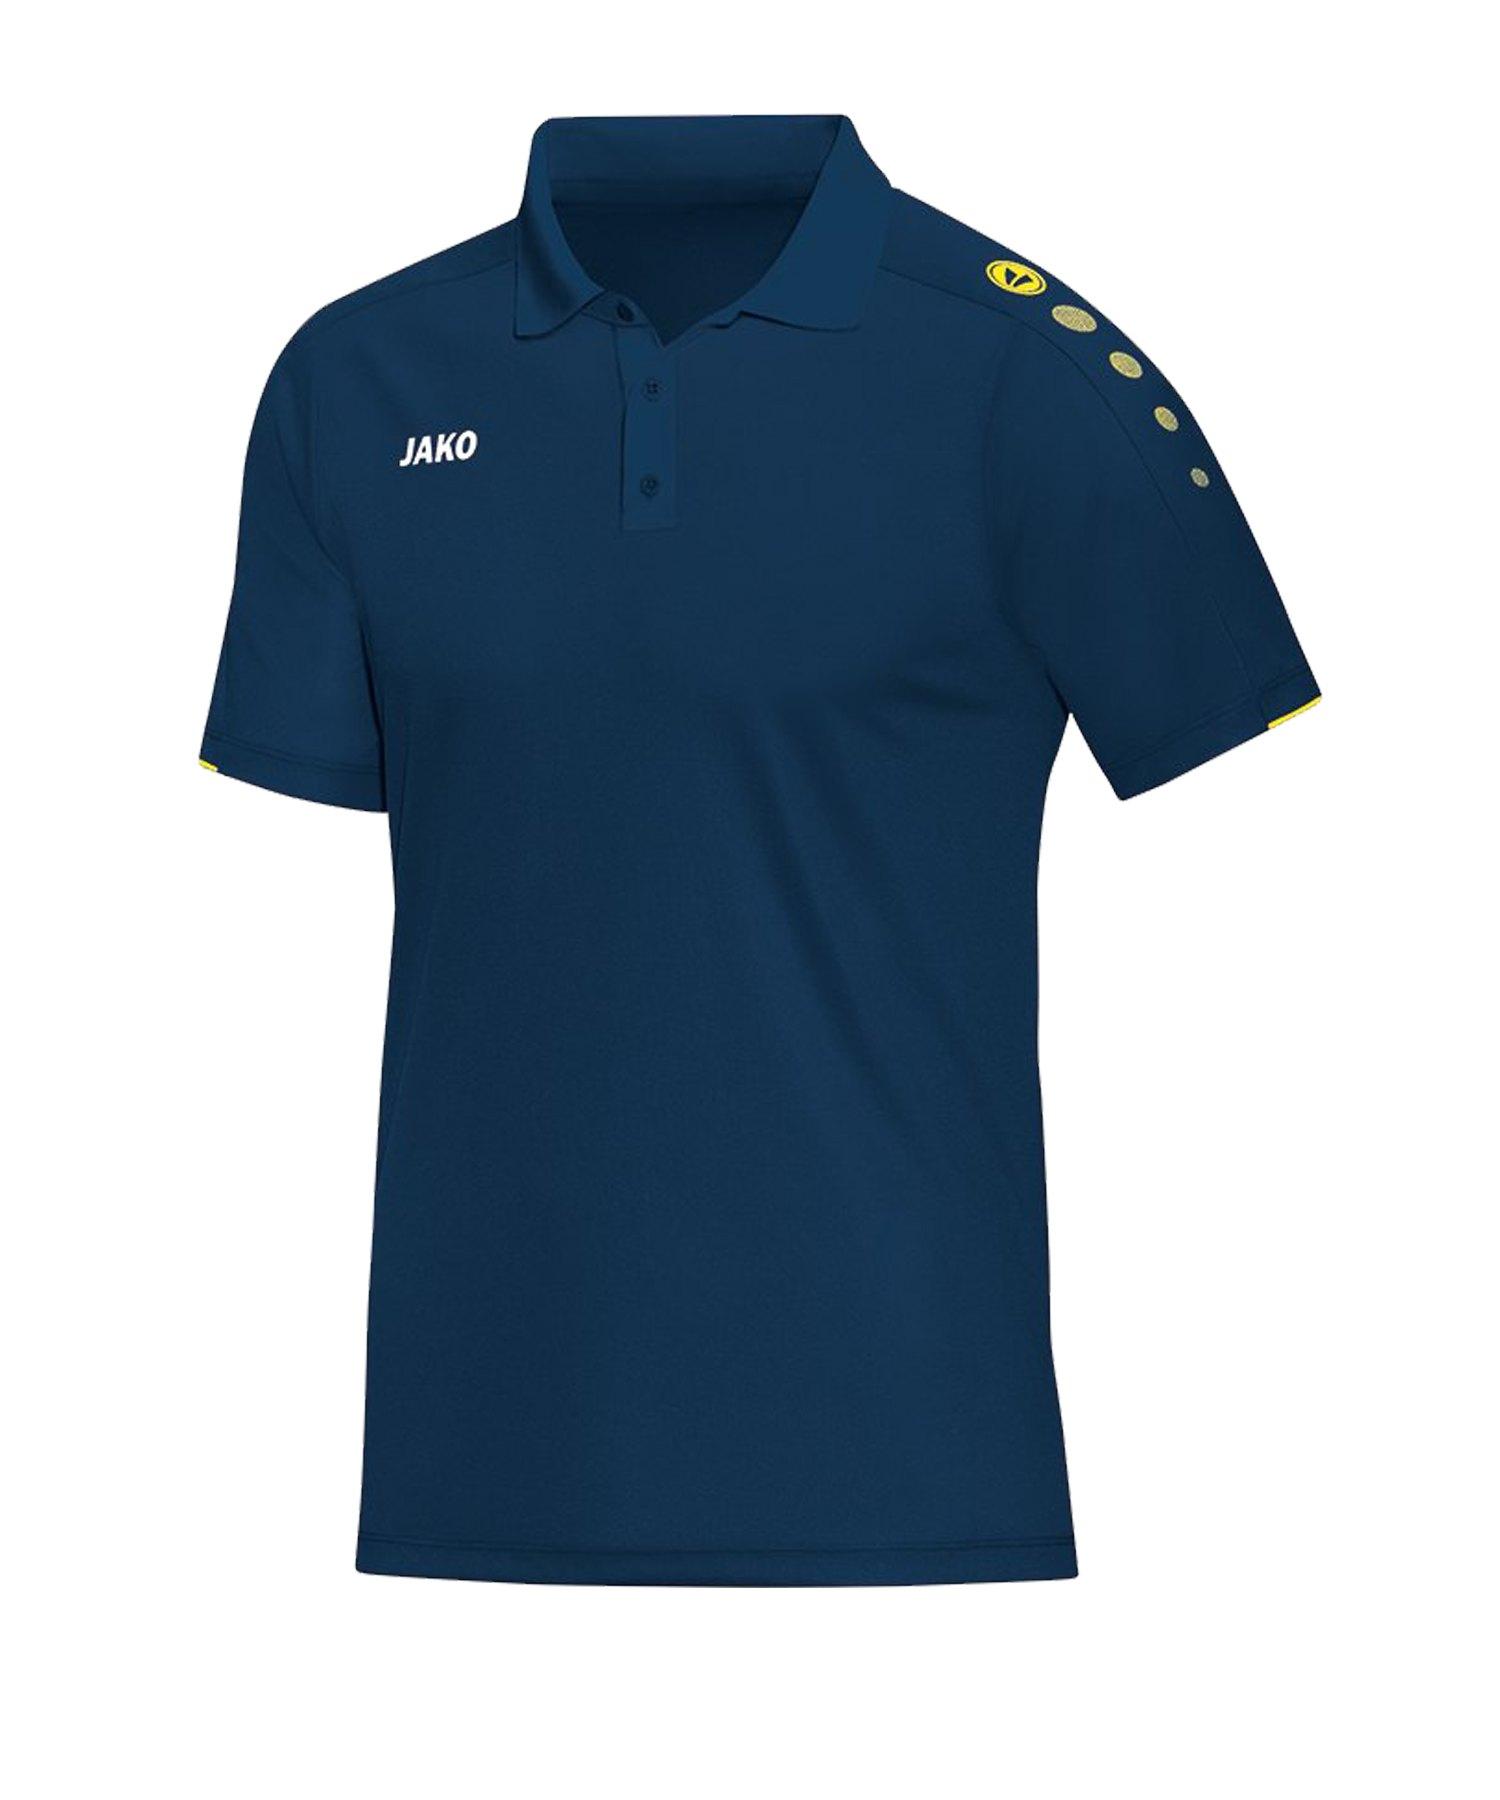 Jako Classico Poloshirt Blau Gelb F42 - Blau